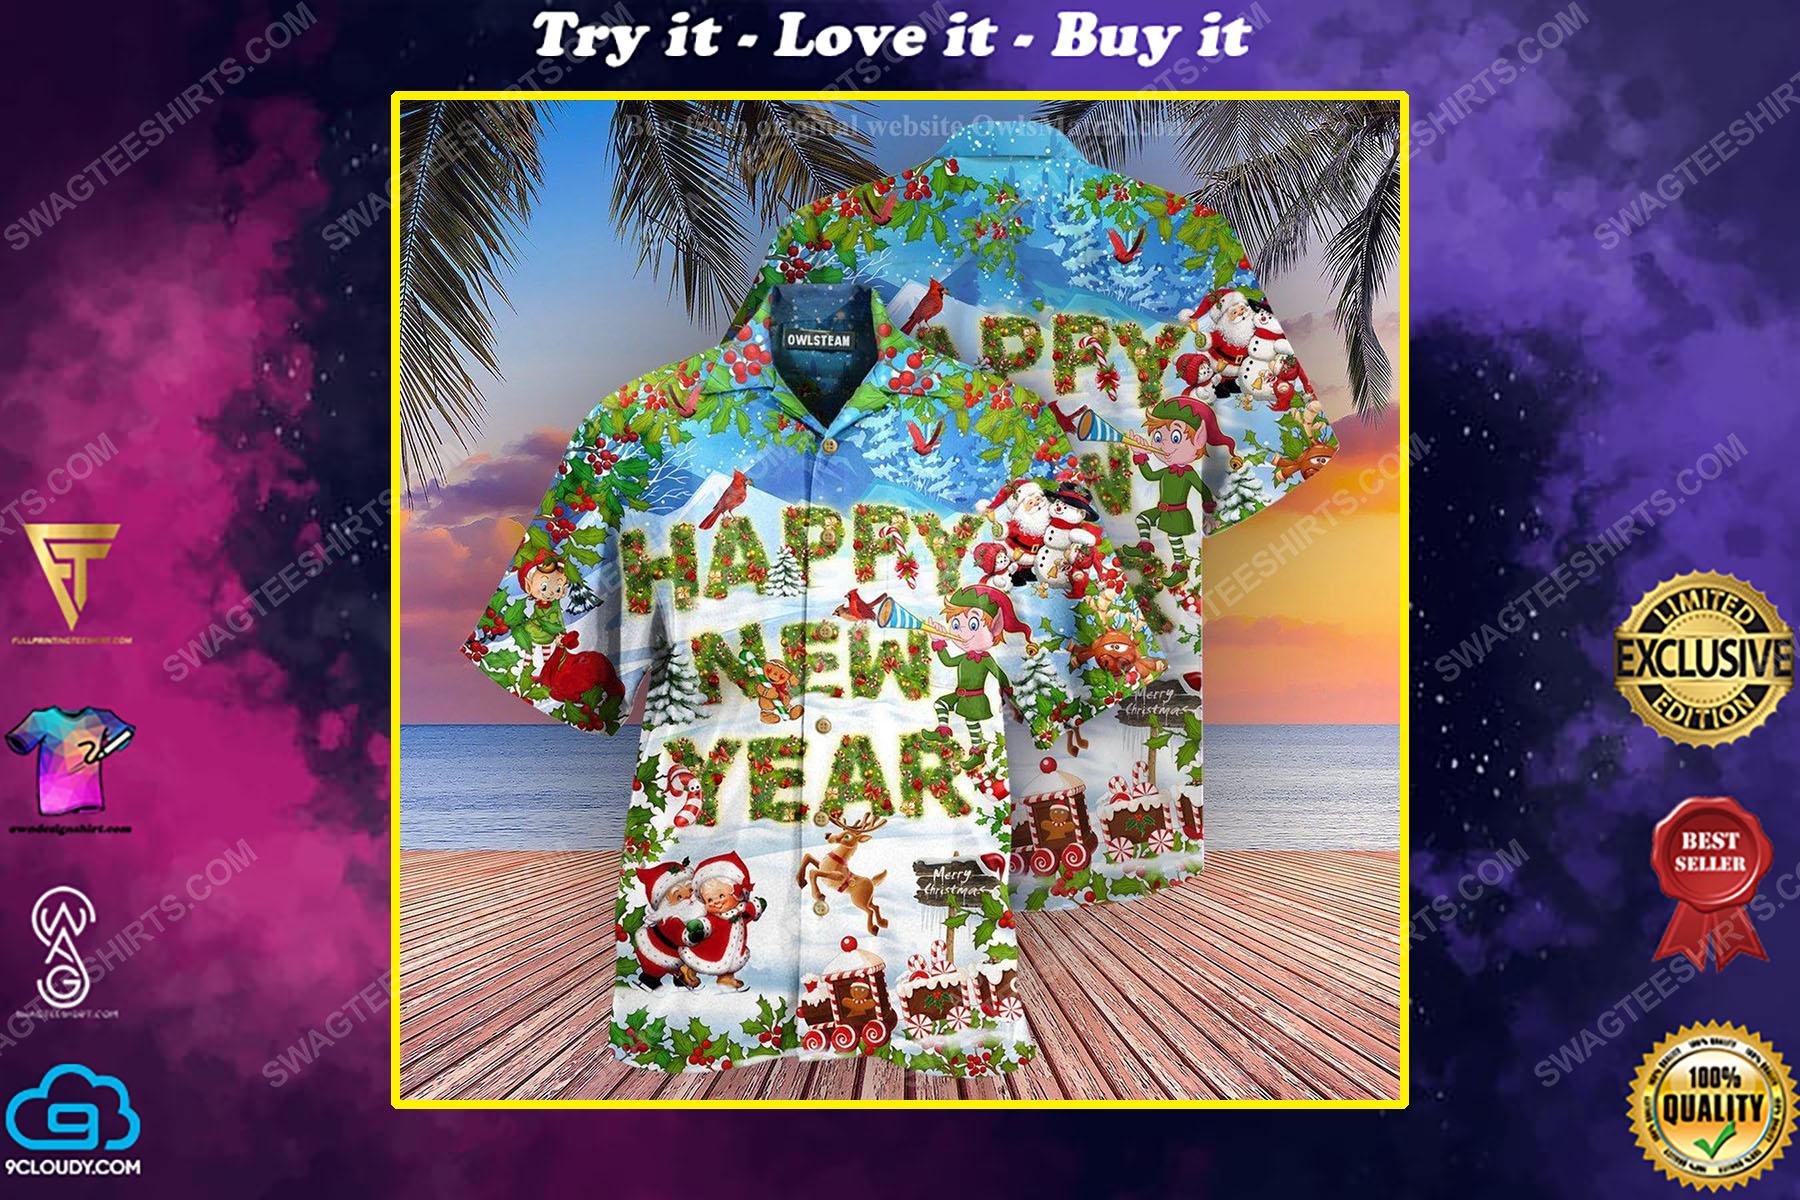 Merry christmas and happy new year full print hawaiian shirt